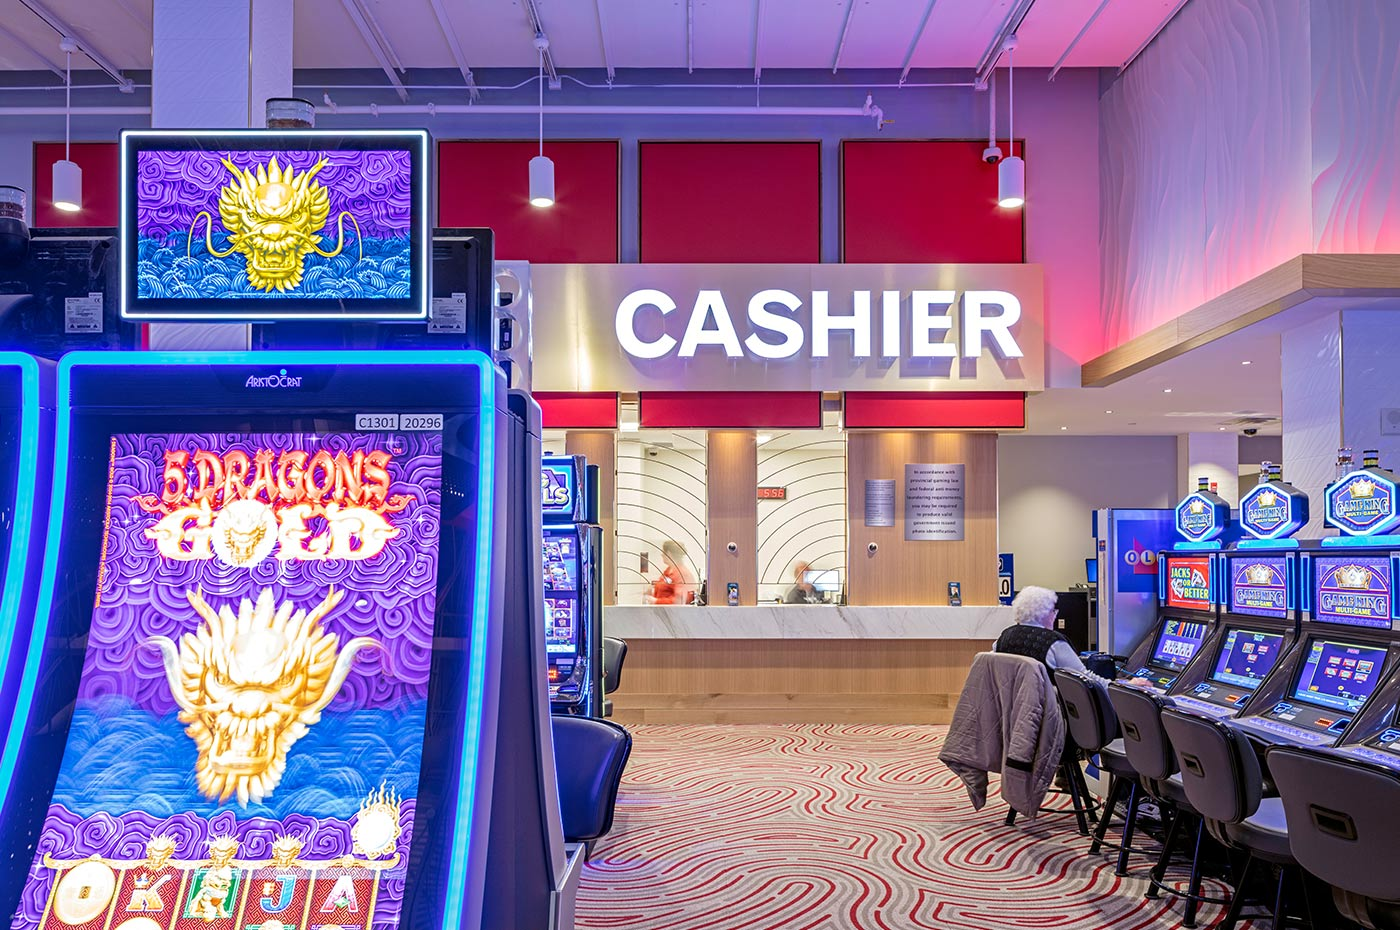 Casino Belleville Cashier